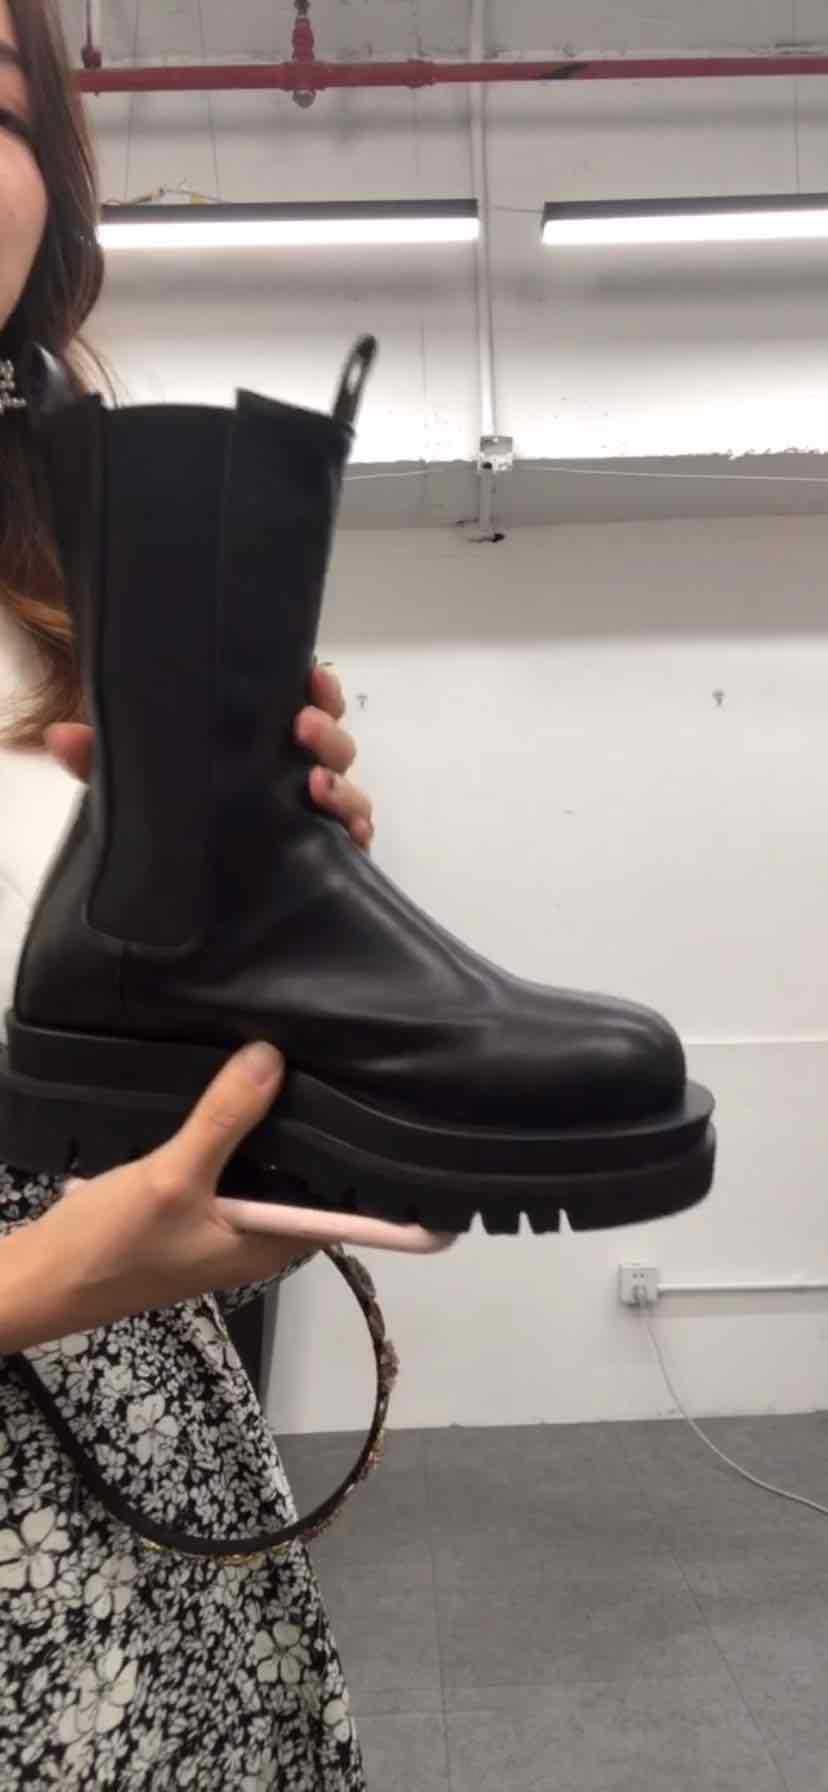 MV3uU 50-WC8201 Kore pamuk koyun derisi ayakkabı 50-WC8201 Kore pamuk koyun derisi ayakkabı